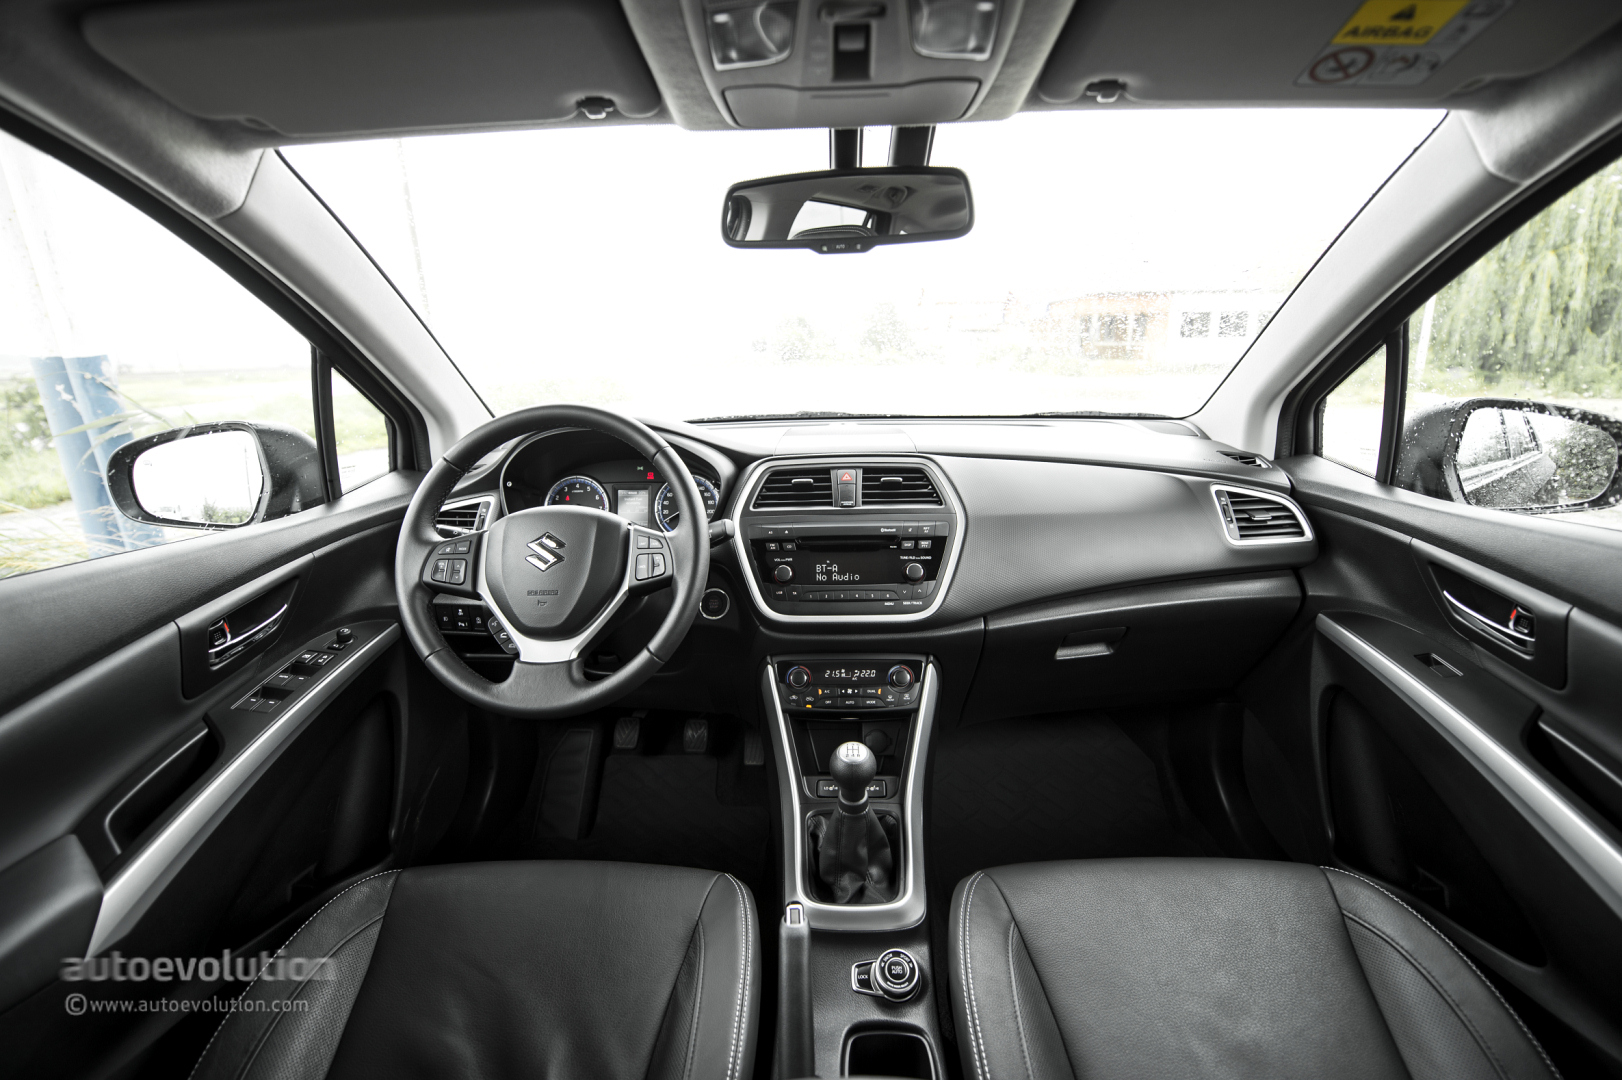 Suzuki Sx Leather Seats